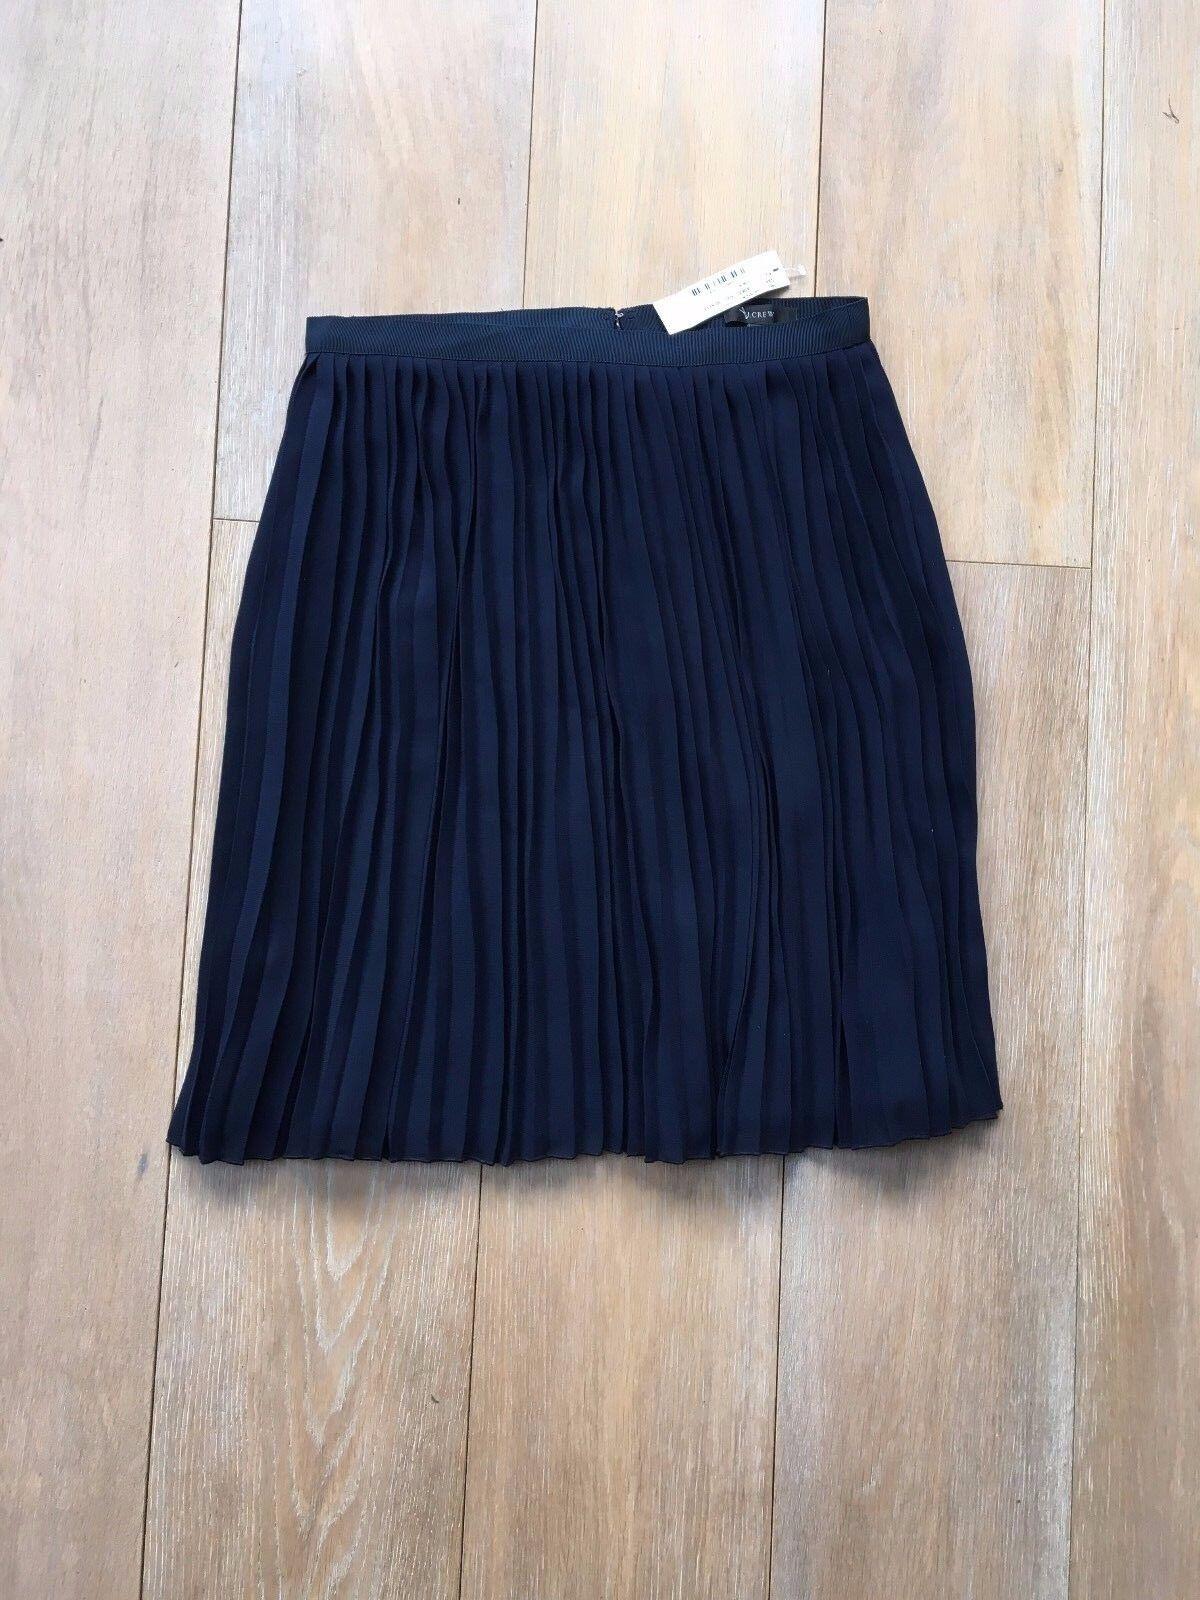 J Crew, skirt, size US 2 BNWT